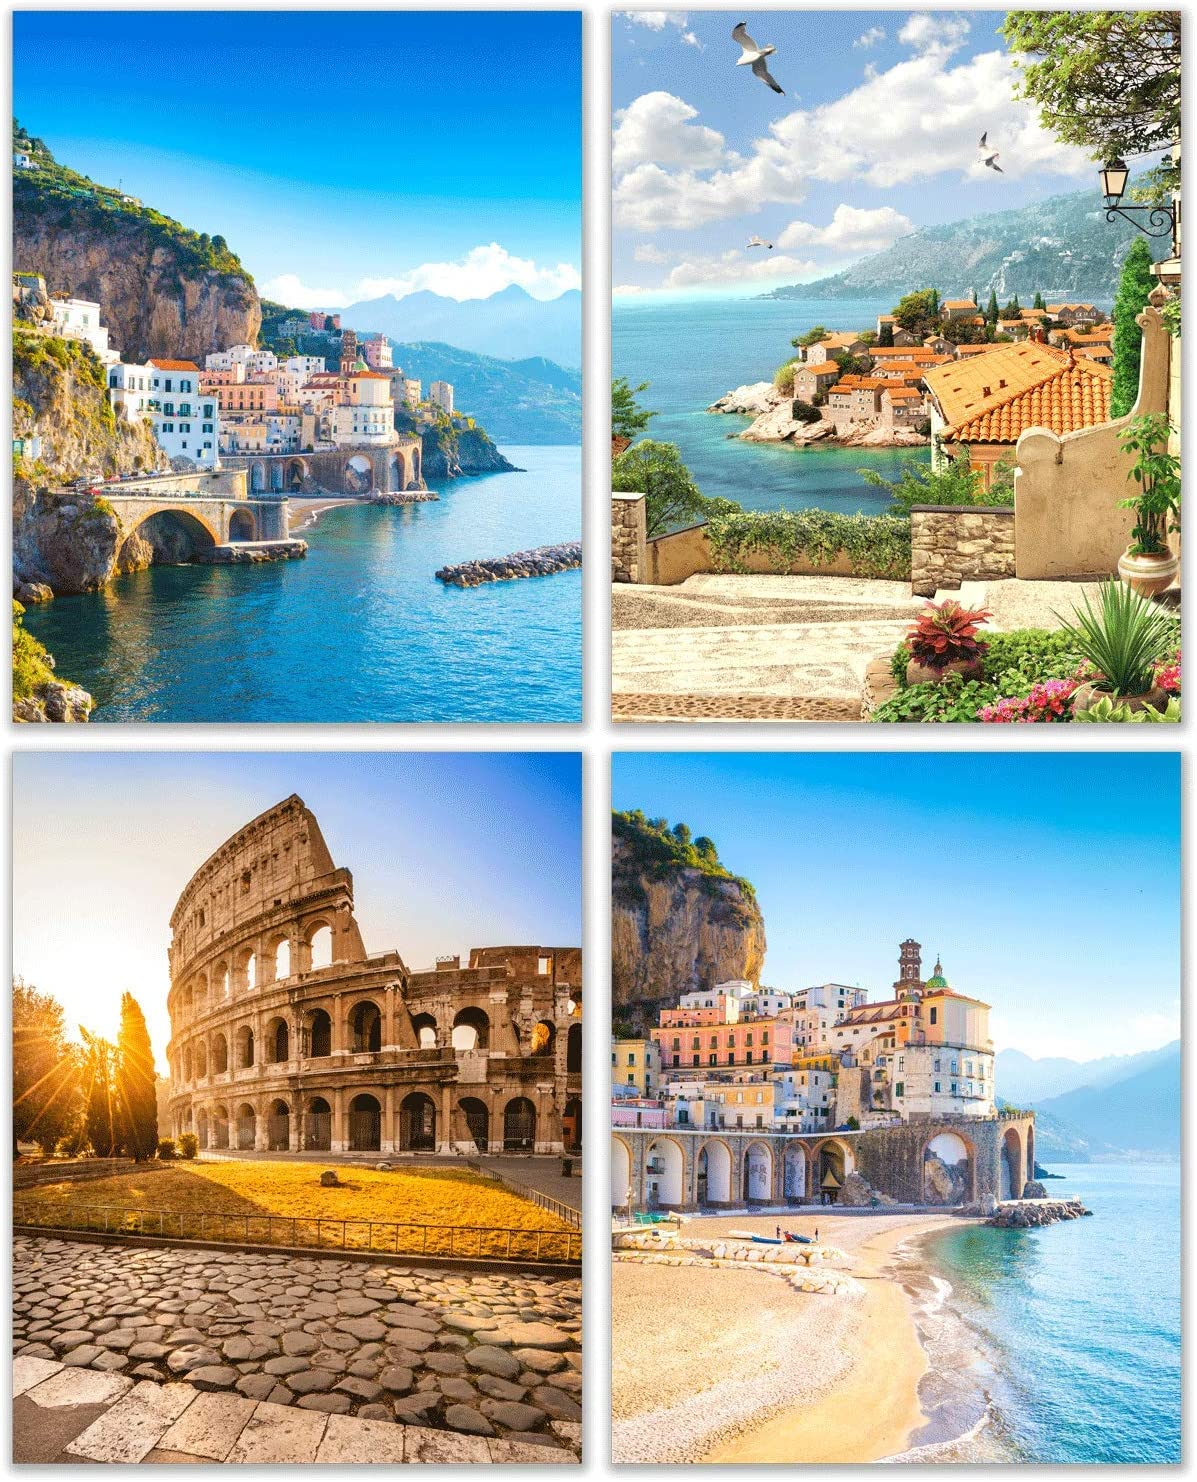 Italy Photography Prints - Italian Scenery - Set of 4 (8x10 Inches) Wall Art Decor - Vibrant Vivid Blue Skys - Sunset Colosseum - Sea - Beach Villas - Coastal Landscape